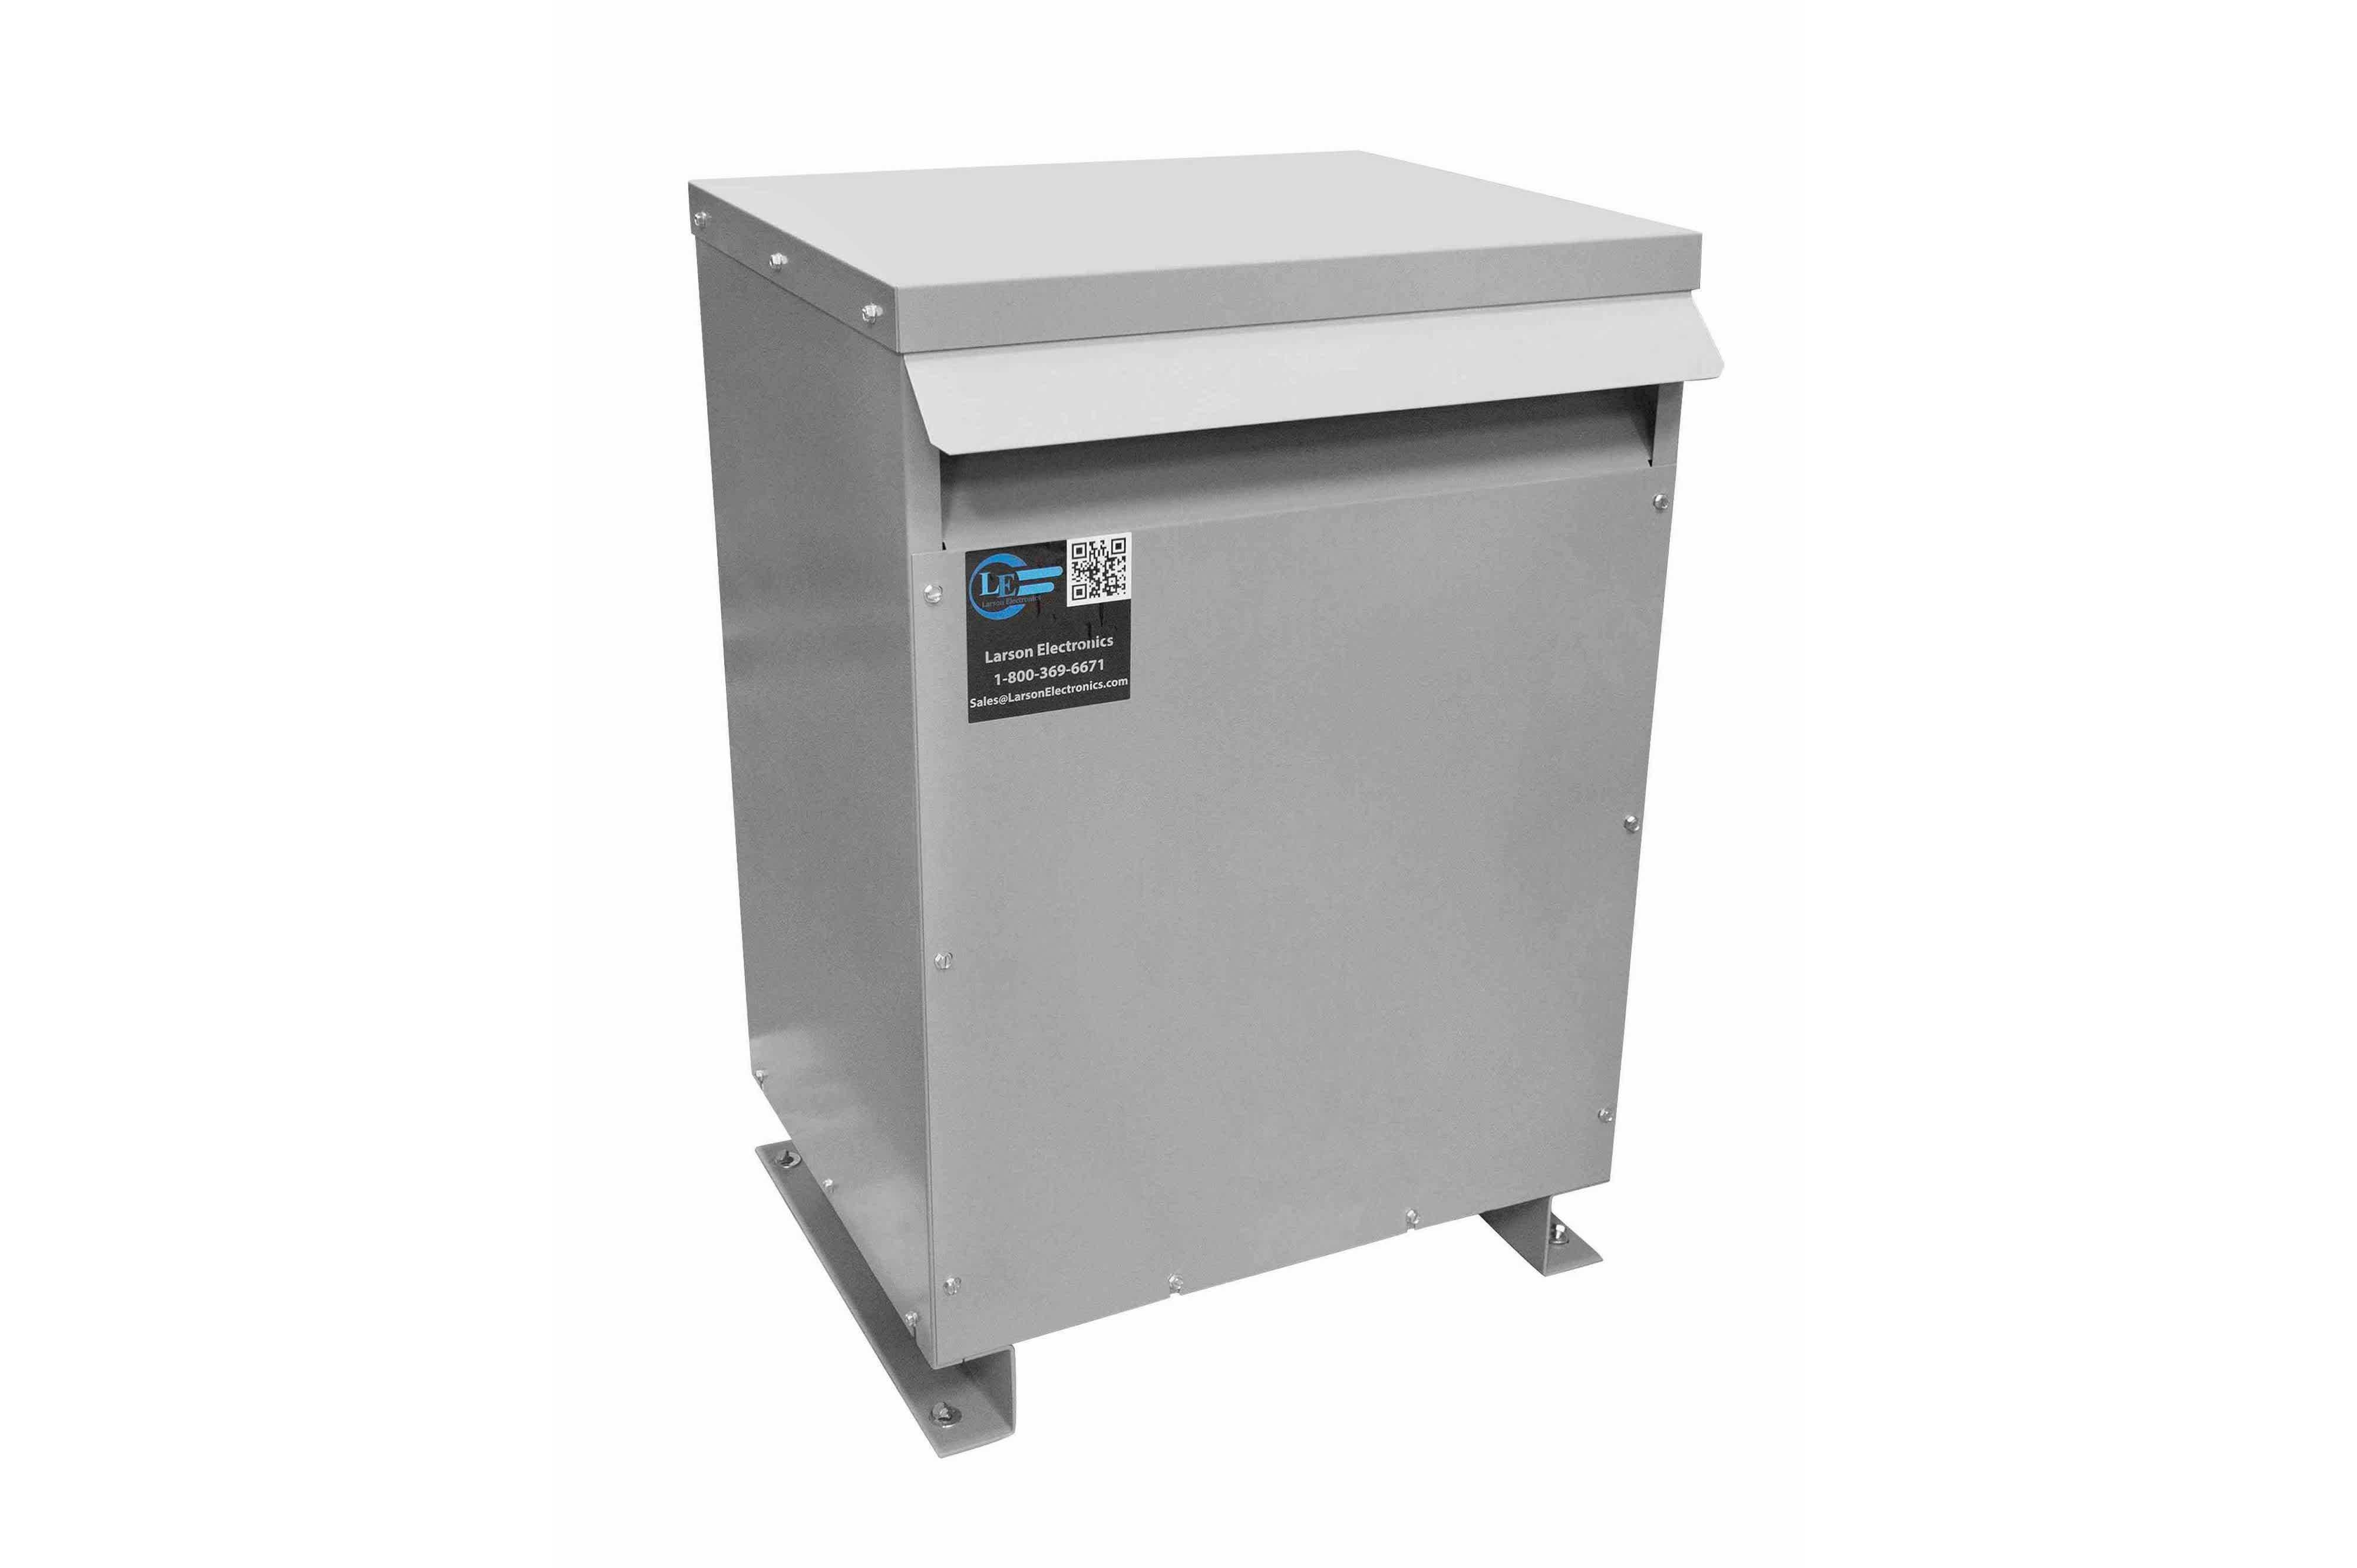 175 kVA 3PH Isolation Transformer, 600V Wye Primary, 415Y/240 Wye-N Secondary, N3R, Ventilated, 60 Hz